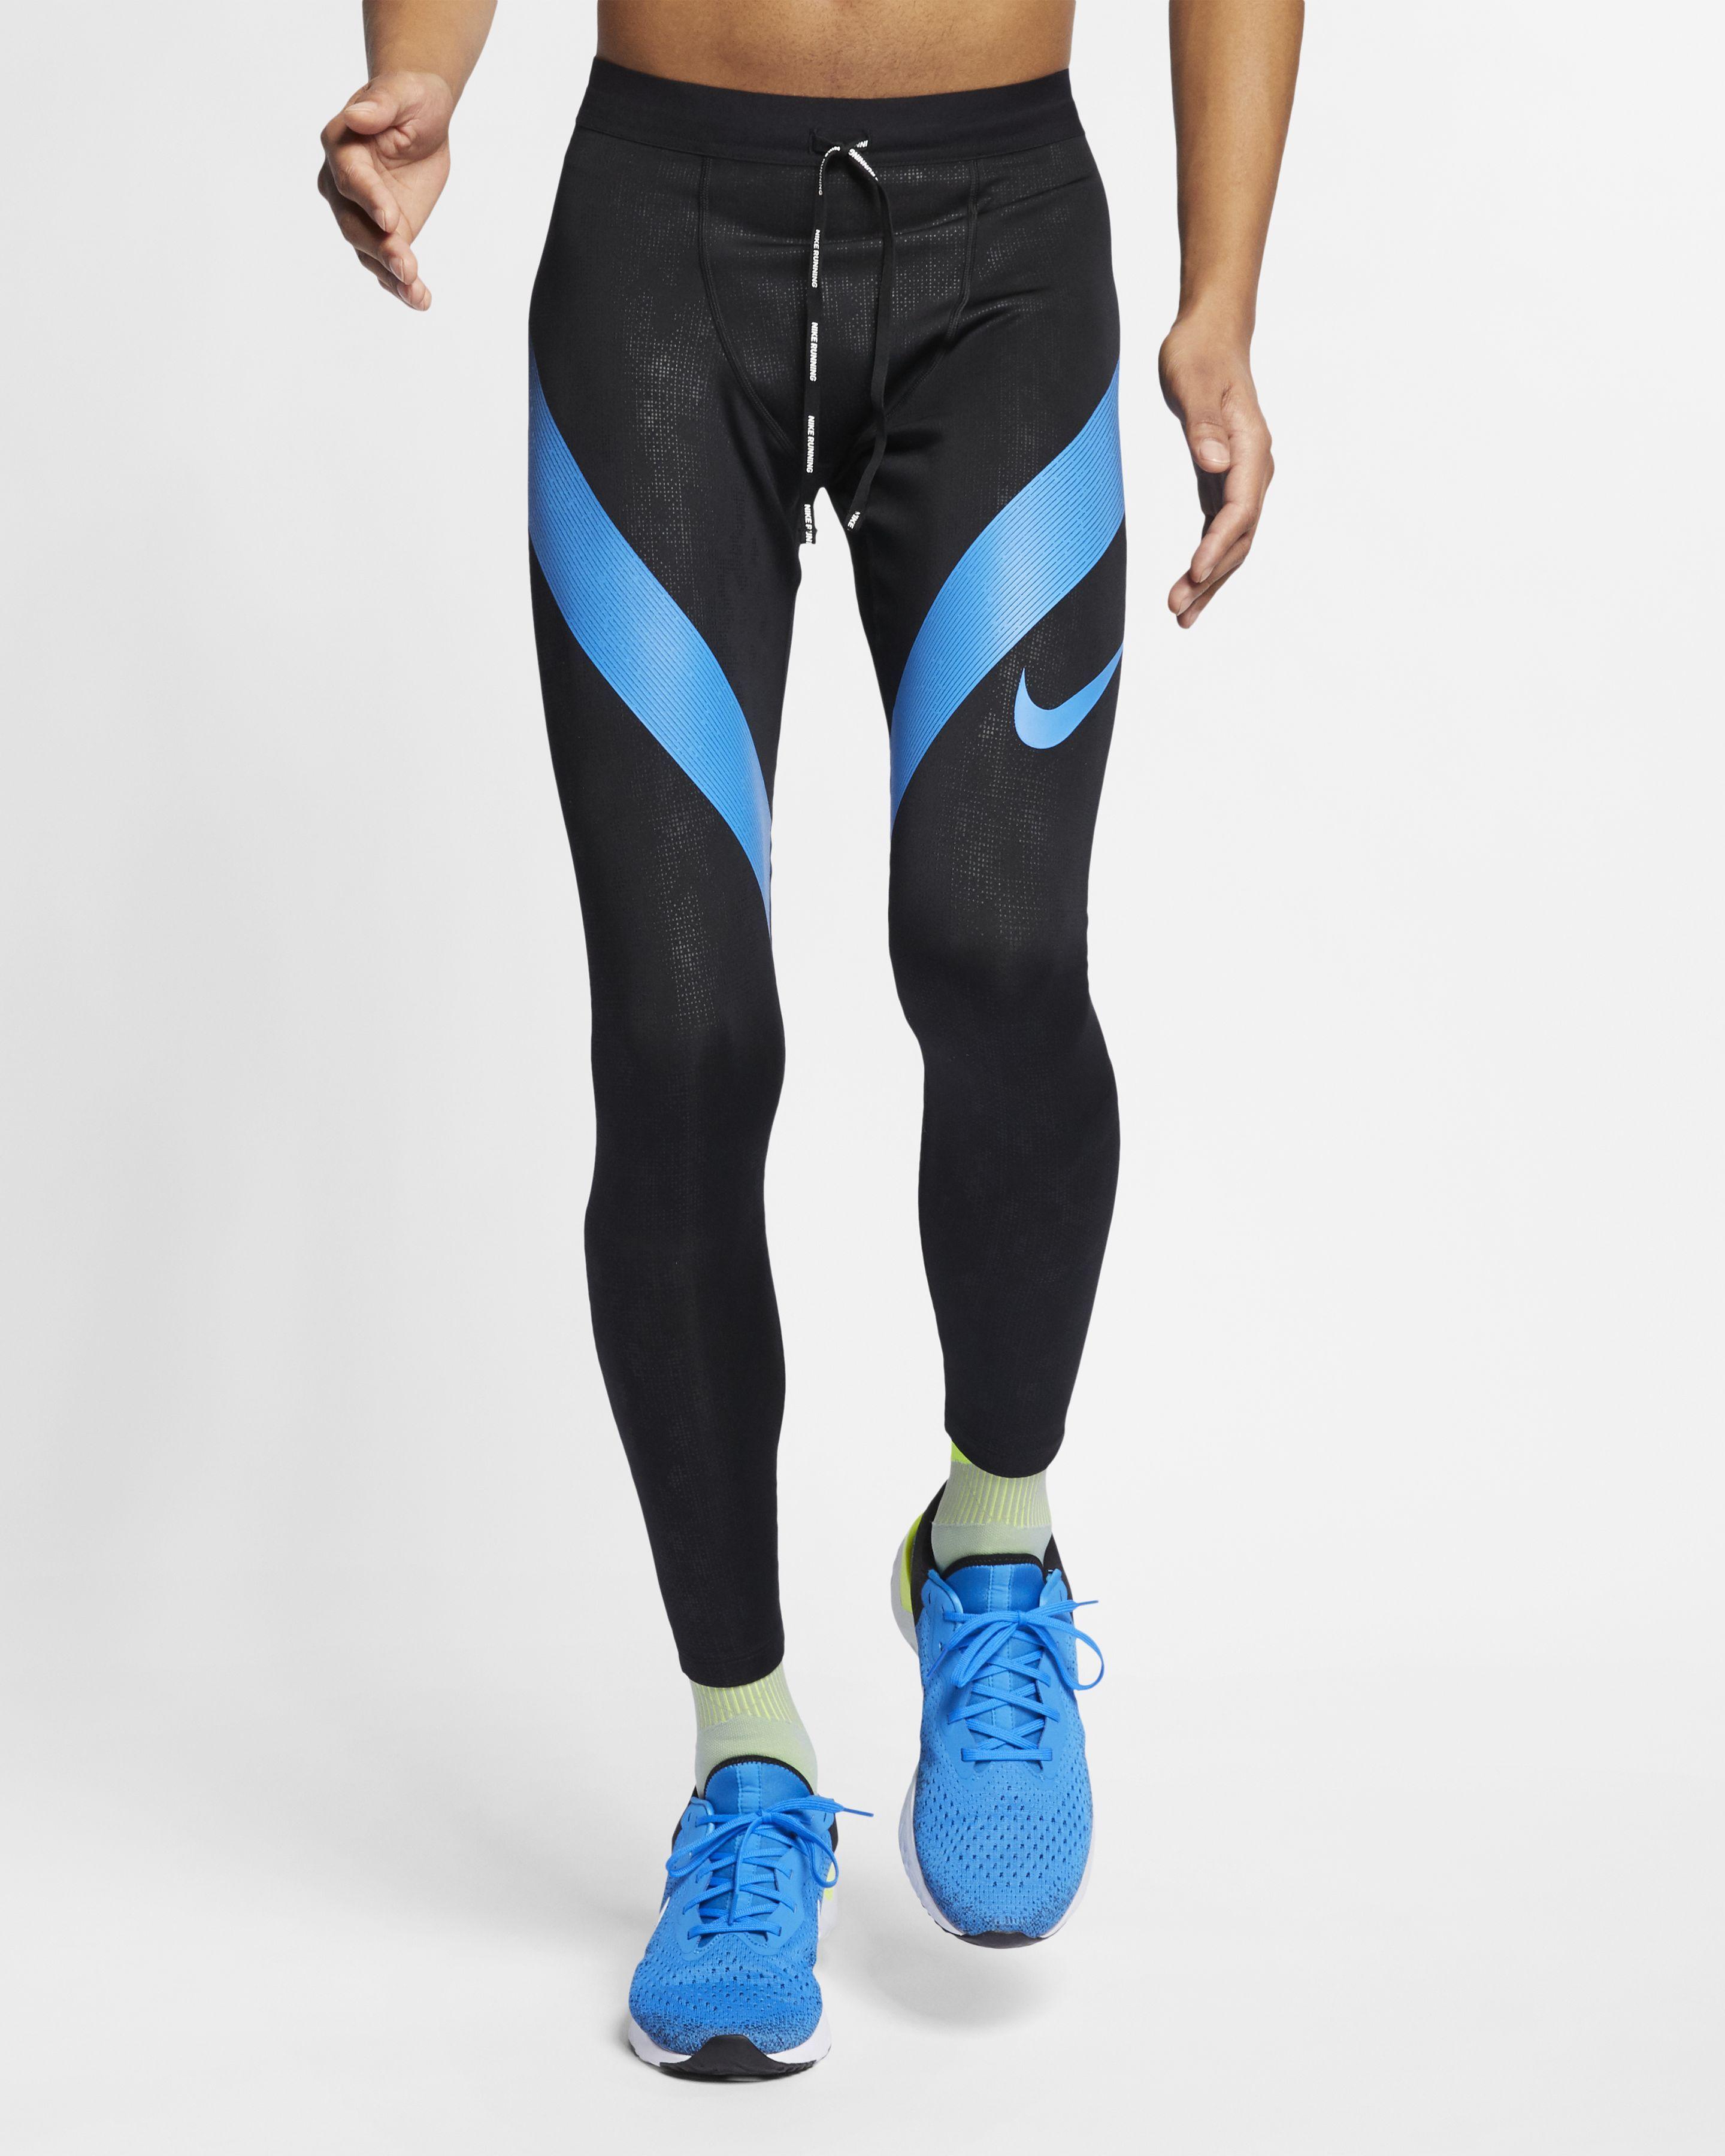 shorts with tights mens